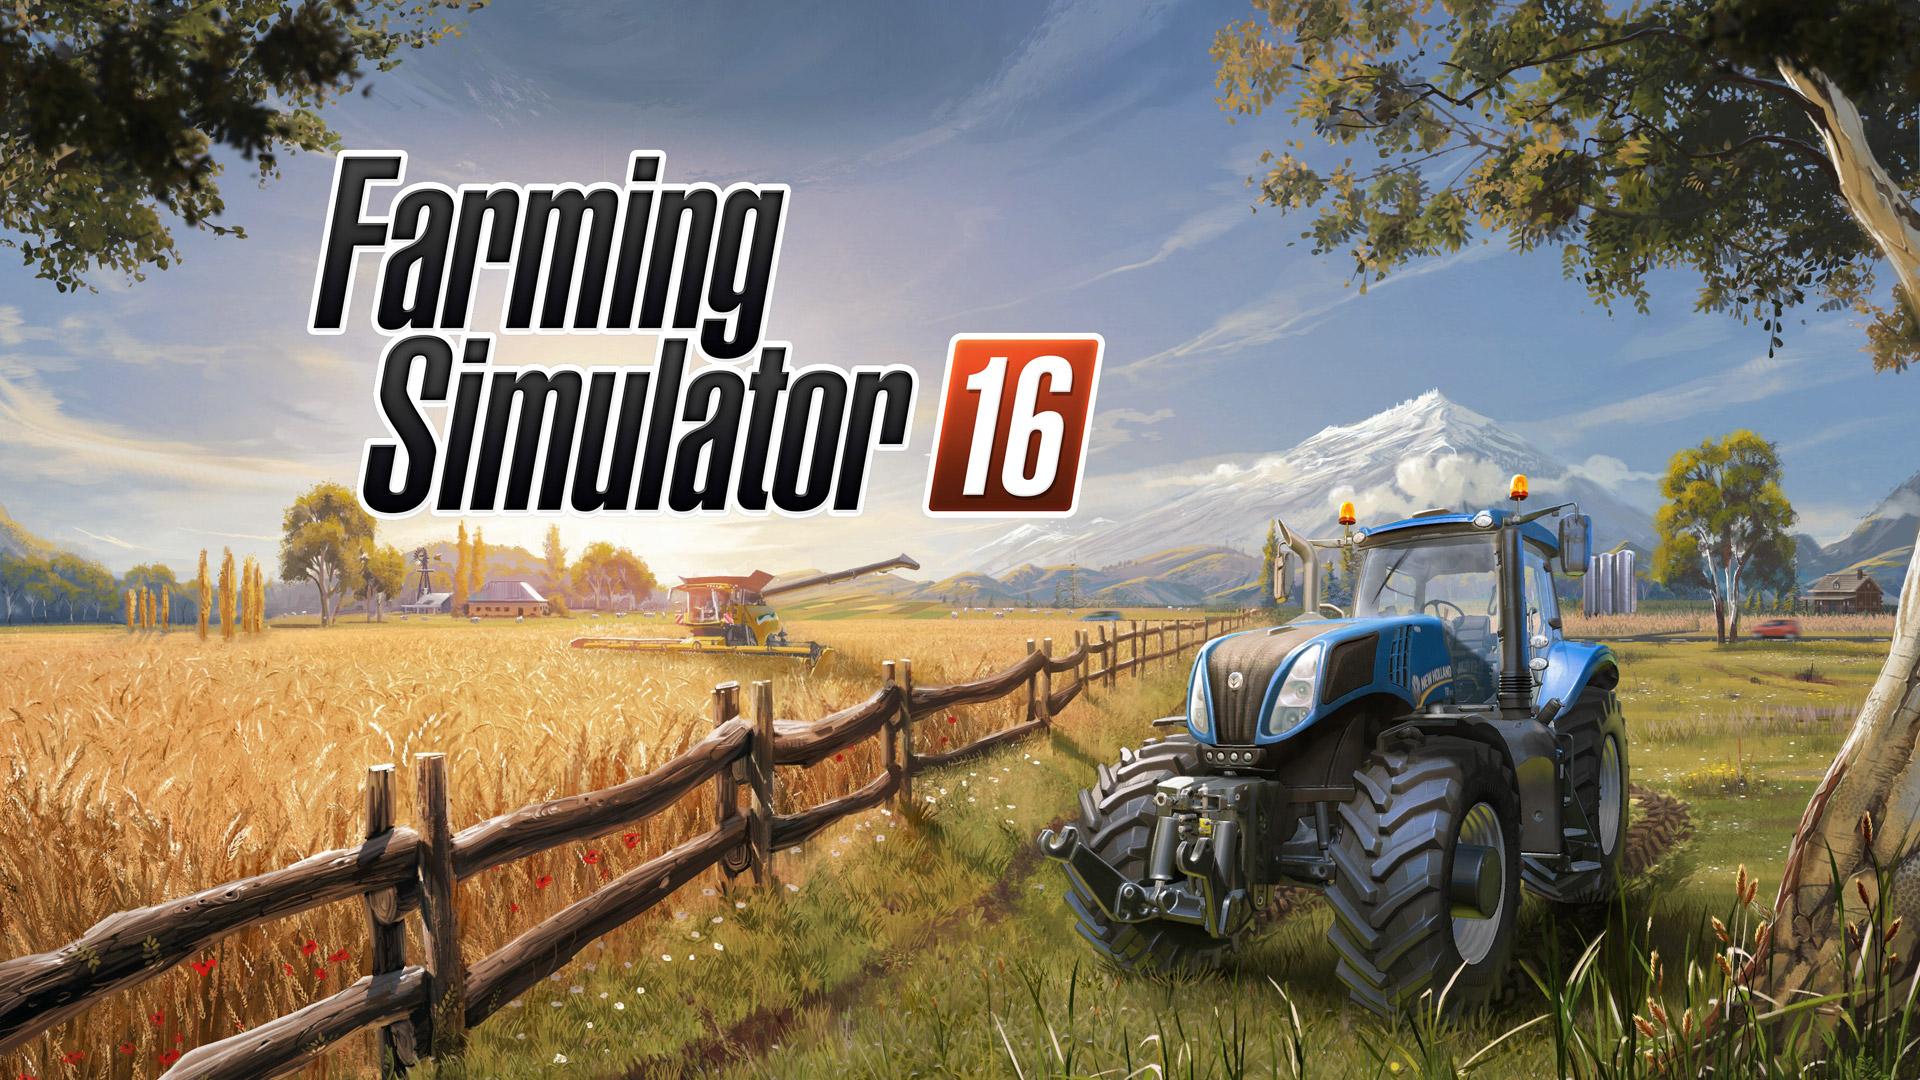 Free Farming Simulator 16 Wallpaper in 1920x1080